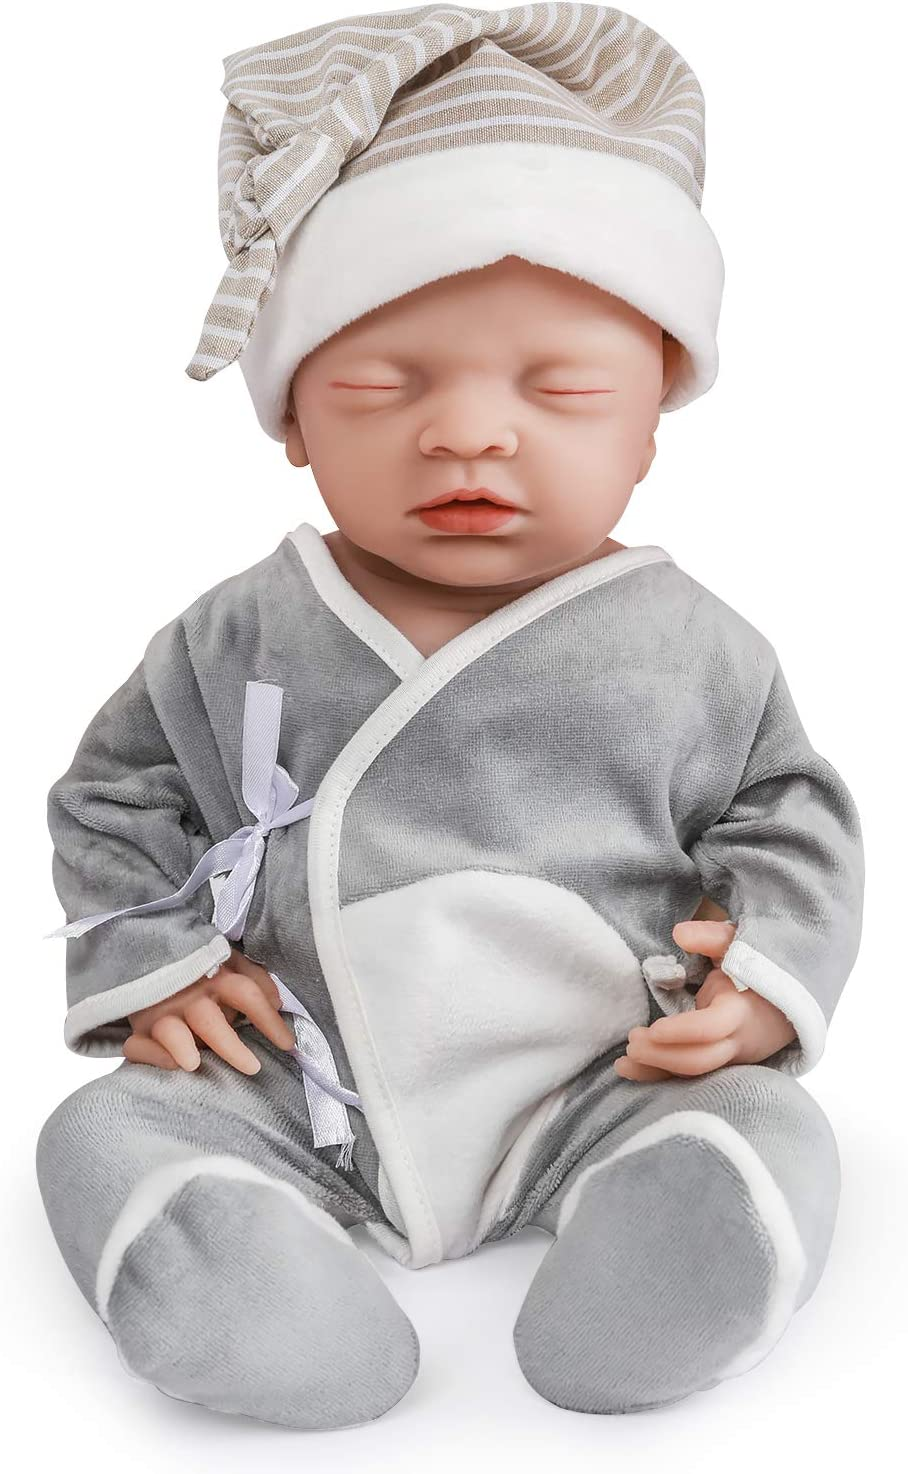 Reborn Toddler Dolls 18/'/' Handmade Lifelike Baby Silicone Vinyl Boy Doll